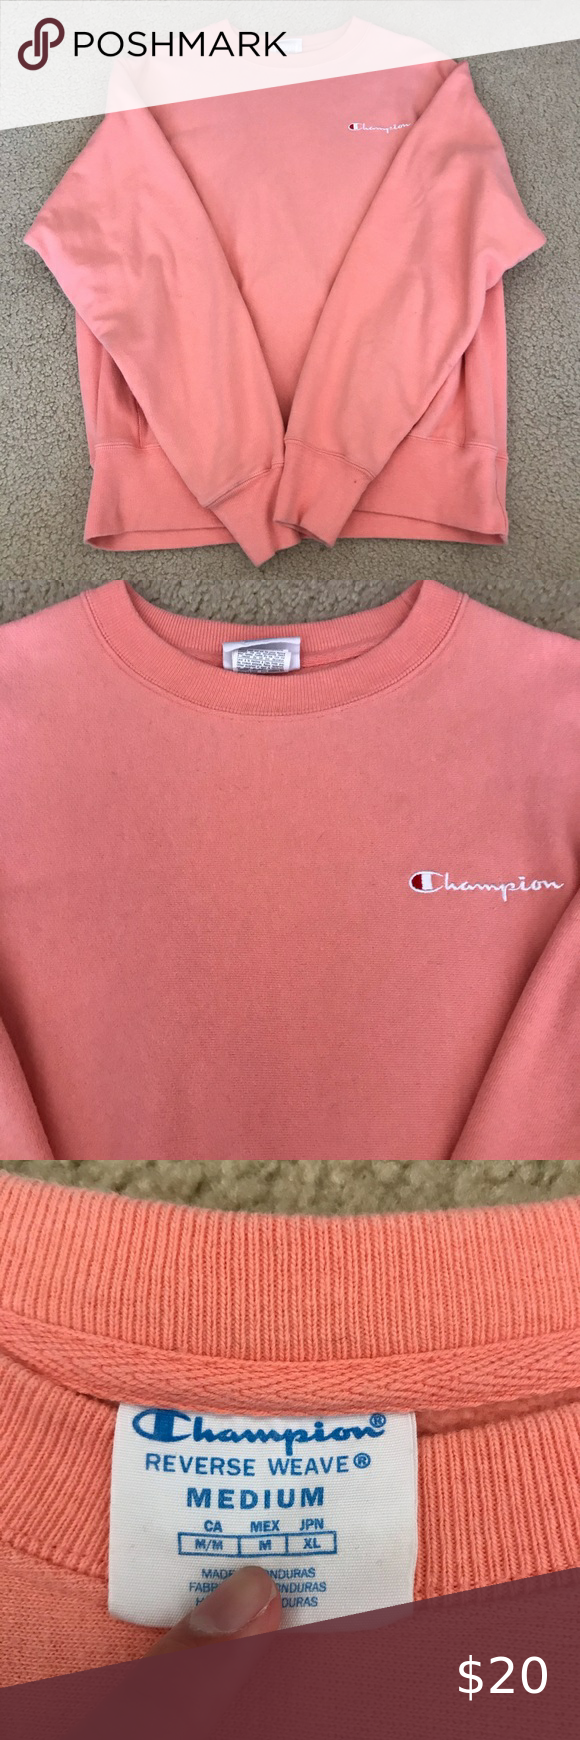 Cute Coral Pink Champion Sweatshirt Champion Sweatshirt Pink Champion Sweatshirt Sweatshirts [ 1740 x 580 Pixel ]